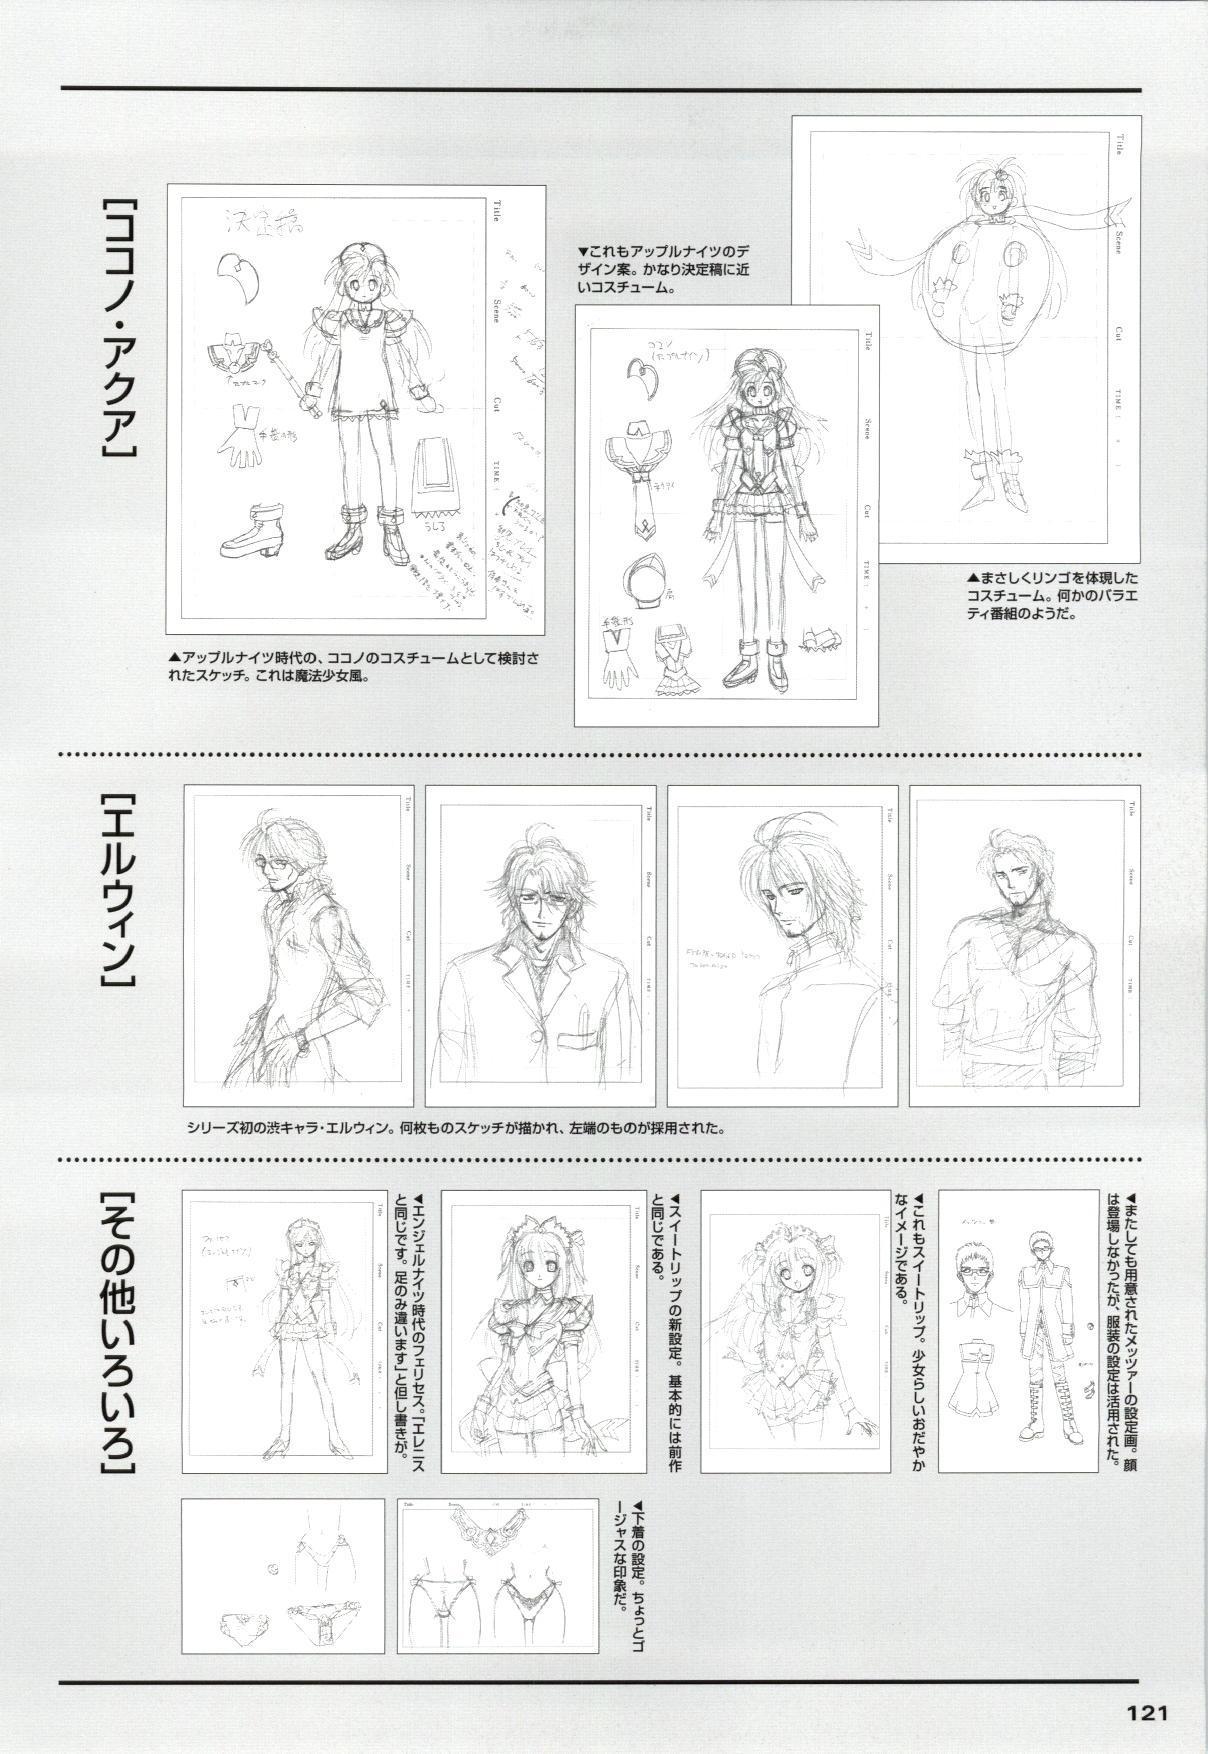 Mahou Senshi Sweet Knight & Mahou Senshi Princess Tear 120